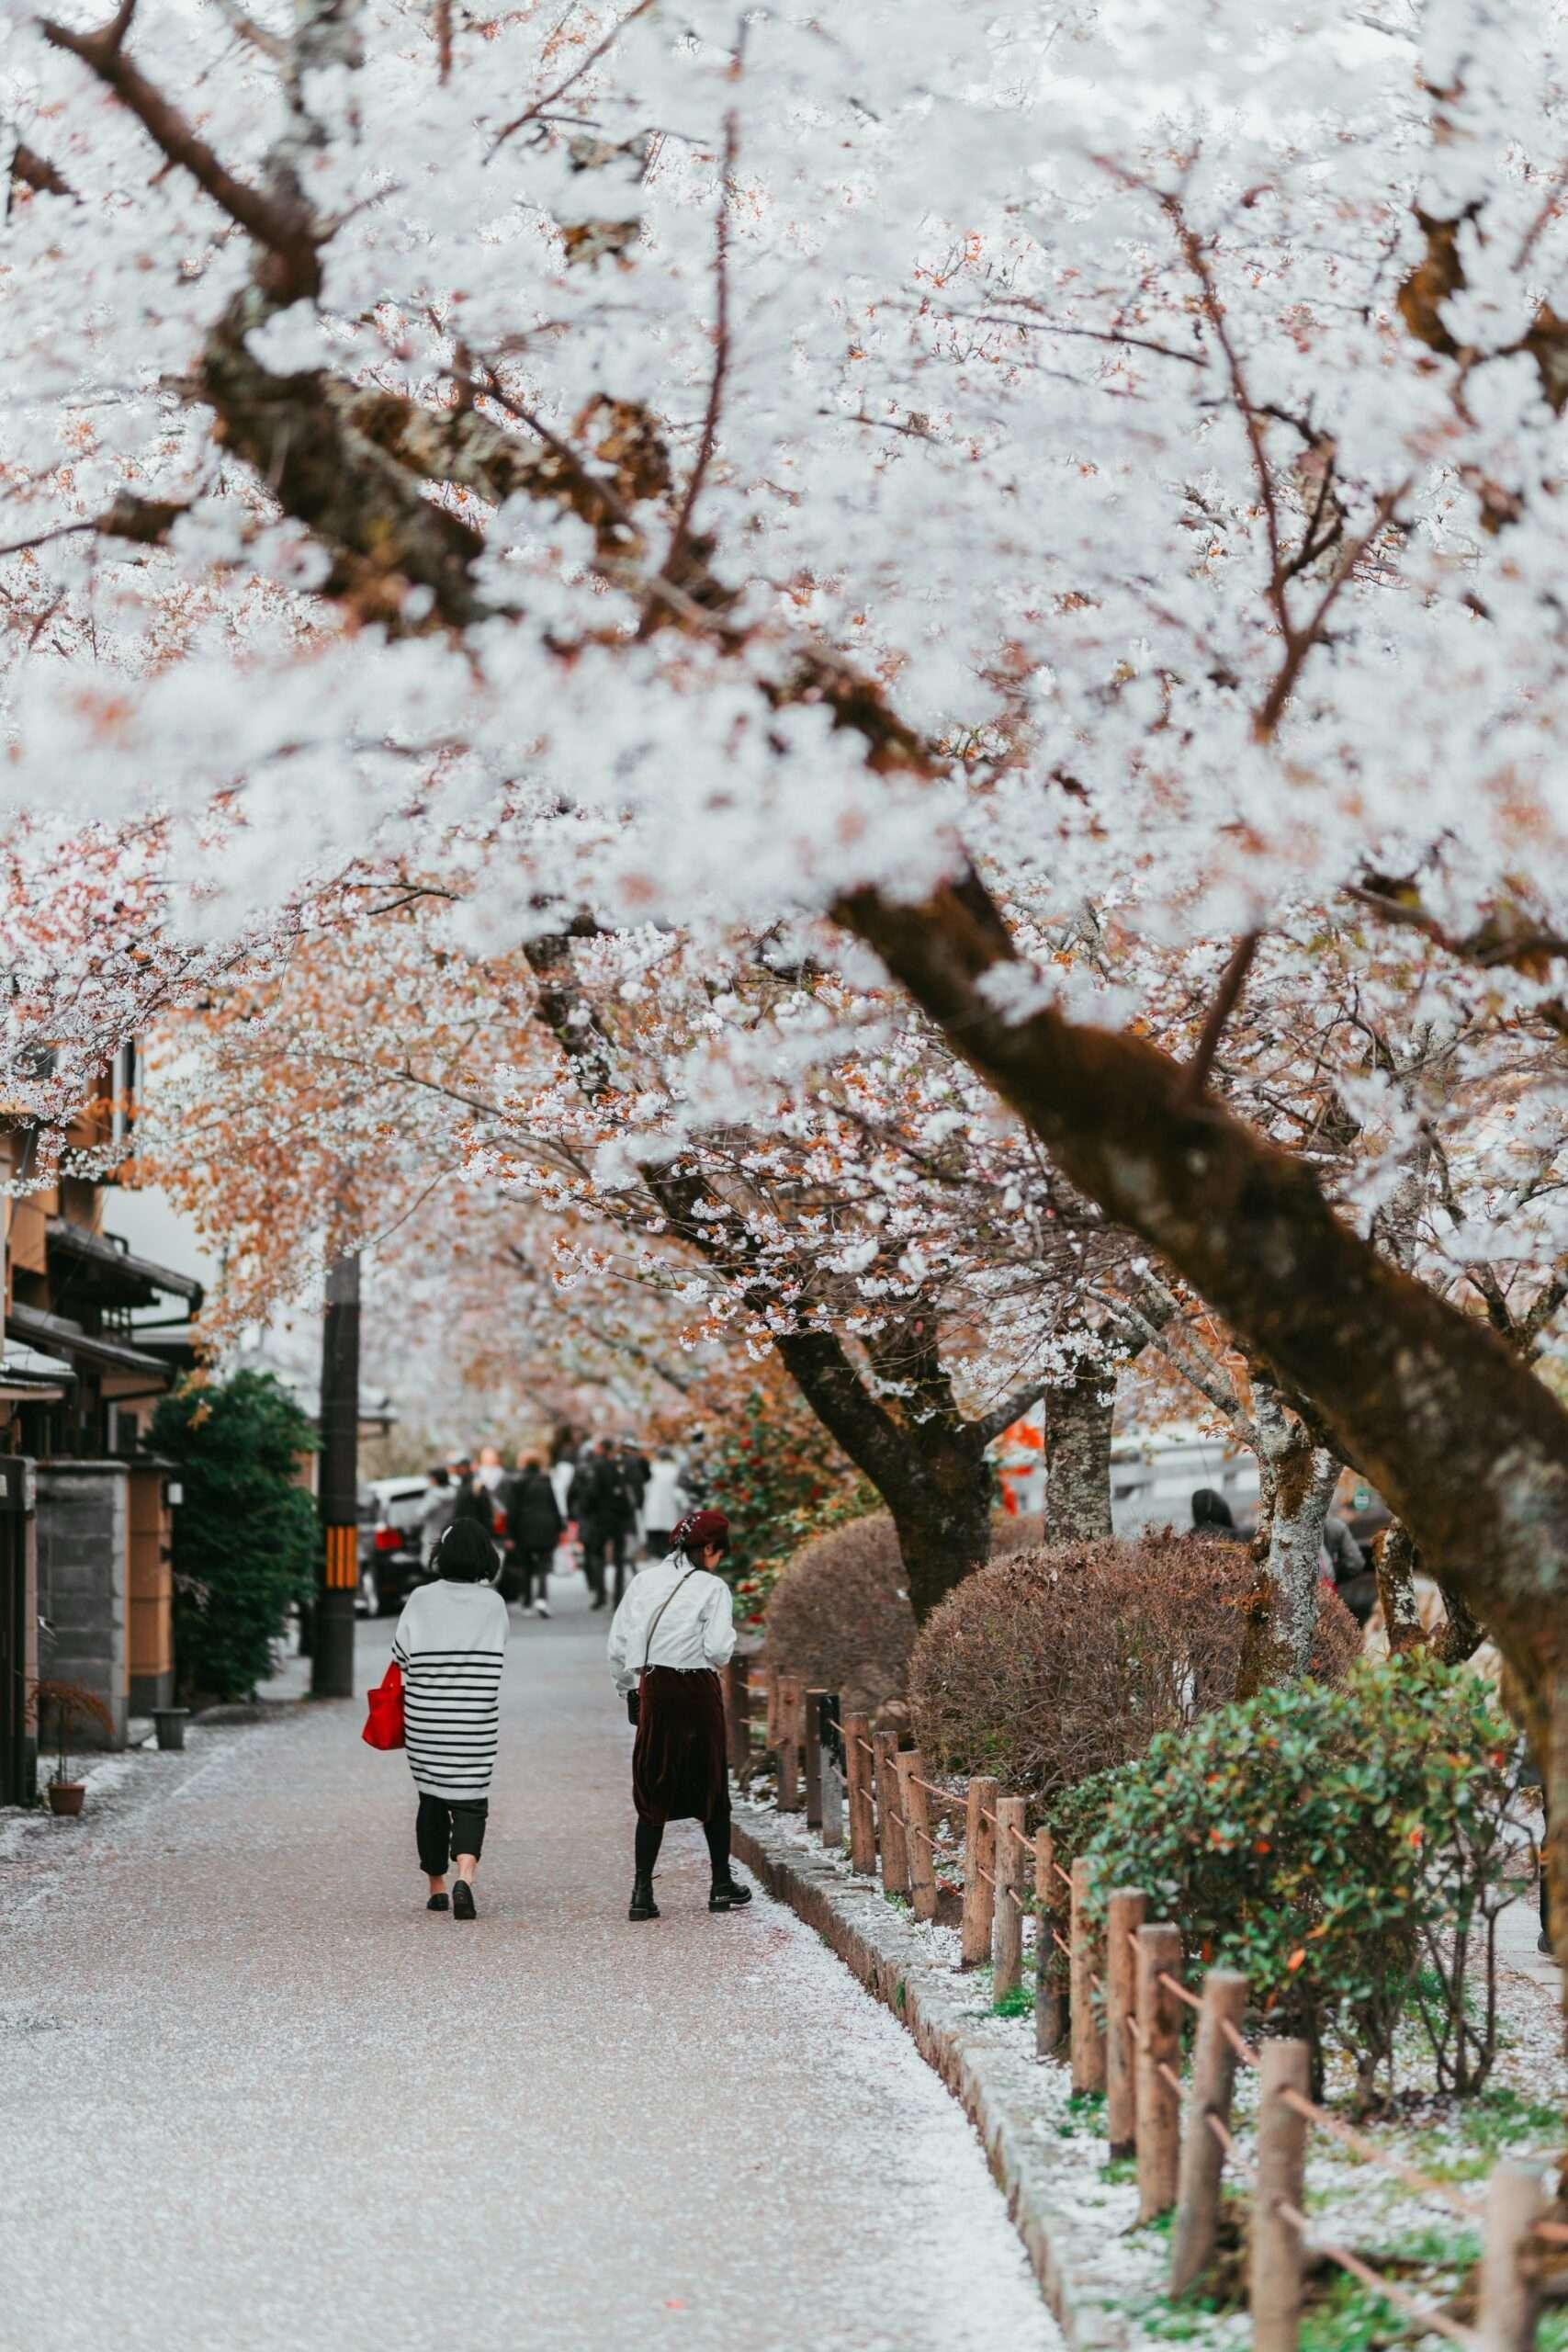 People walk along cherry blossom lined sidewalk in Kyoto